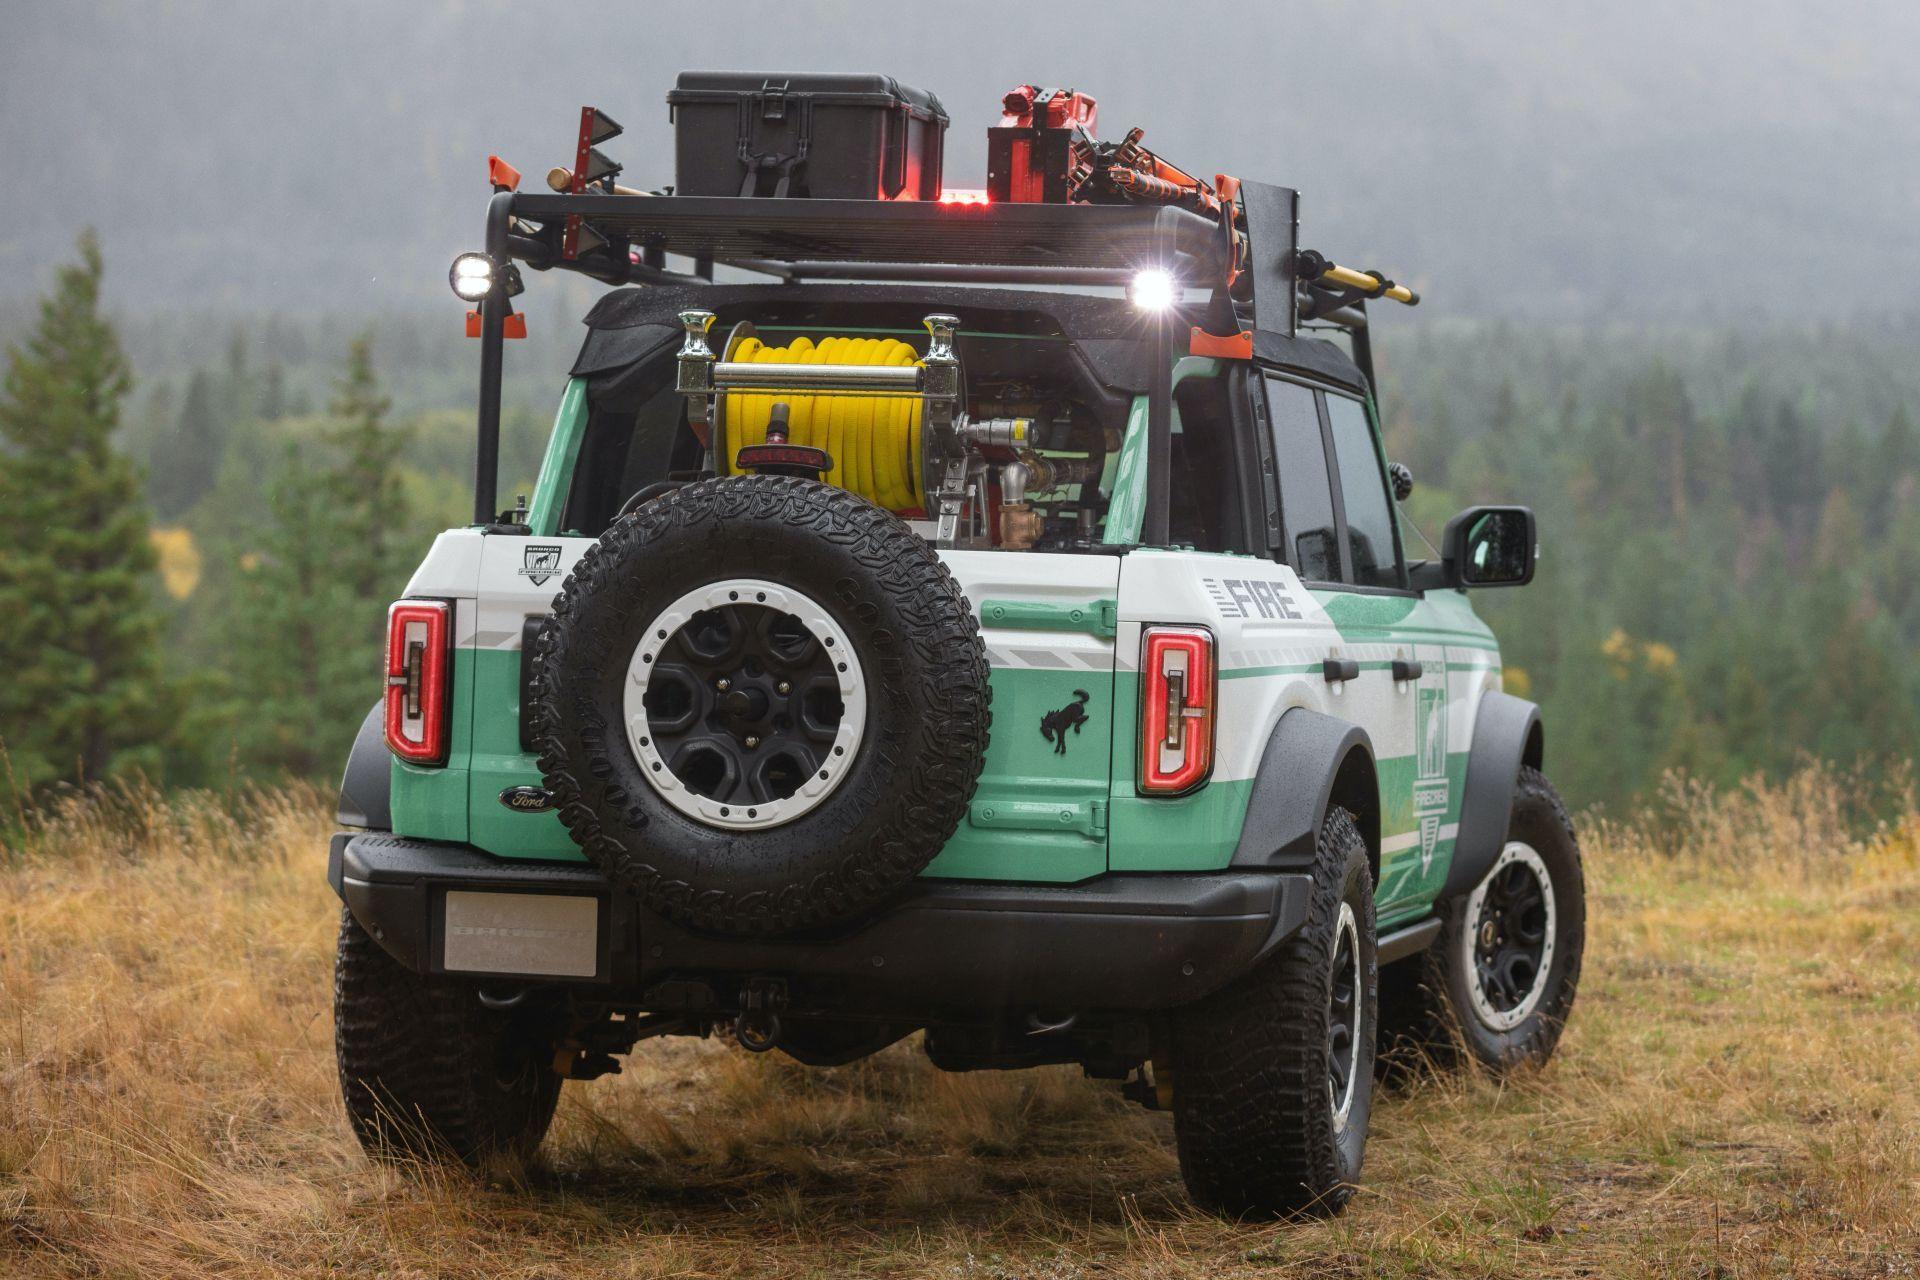 Ford-Bronco-Wildland-Fire-Rig-Concept-2